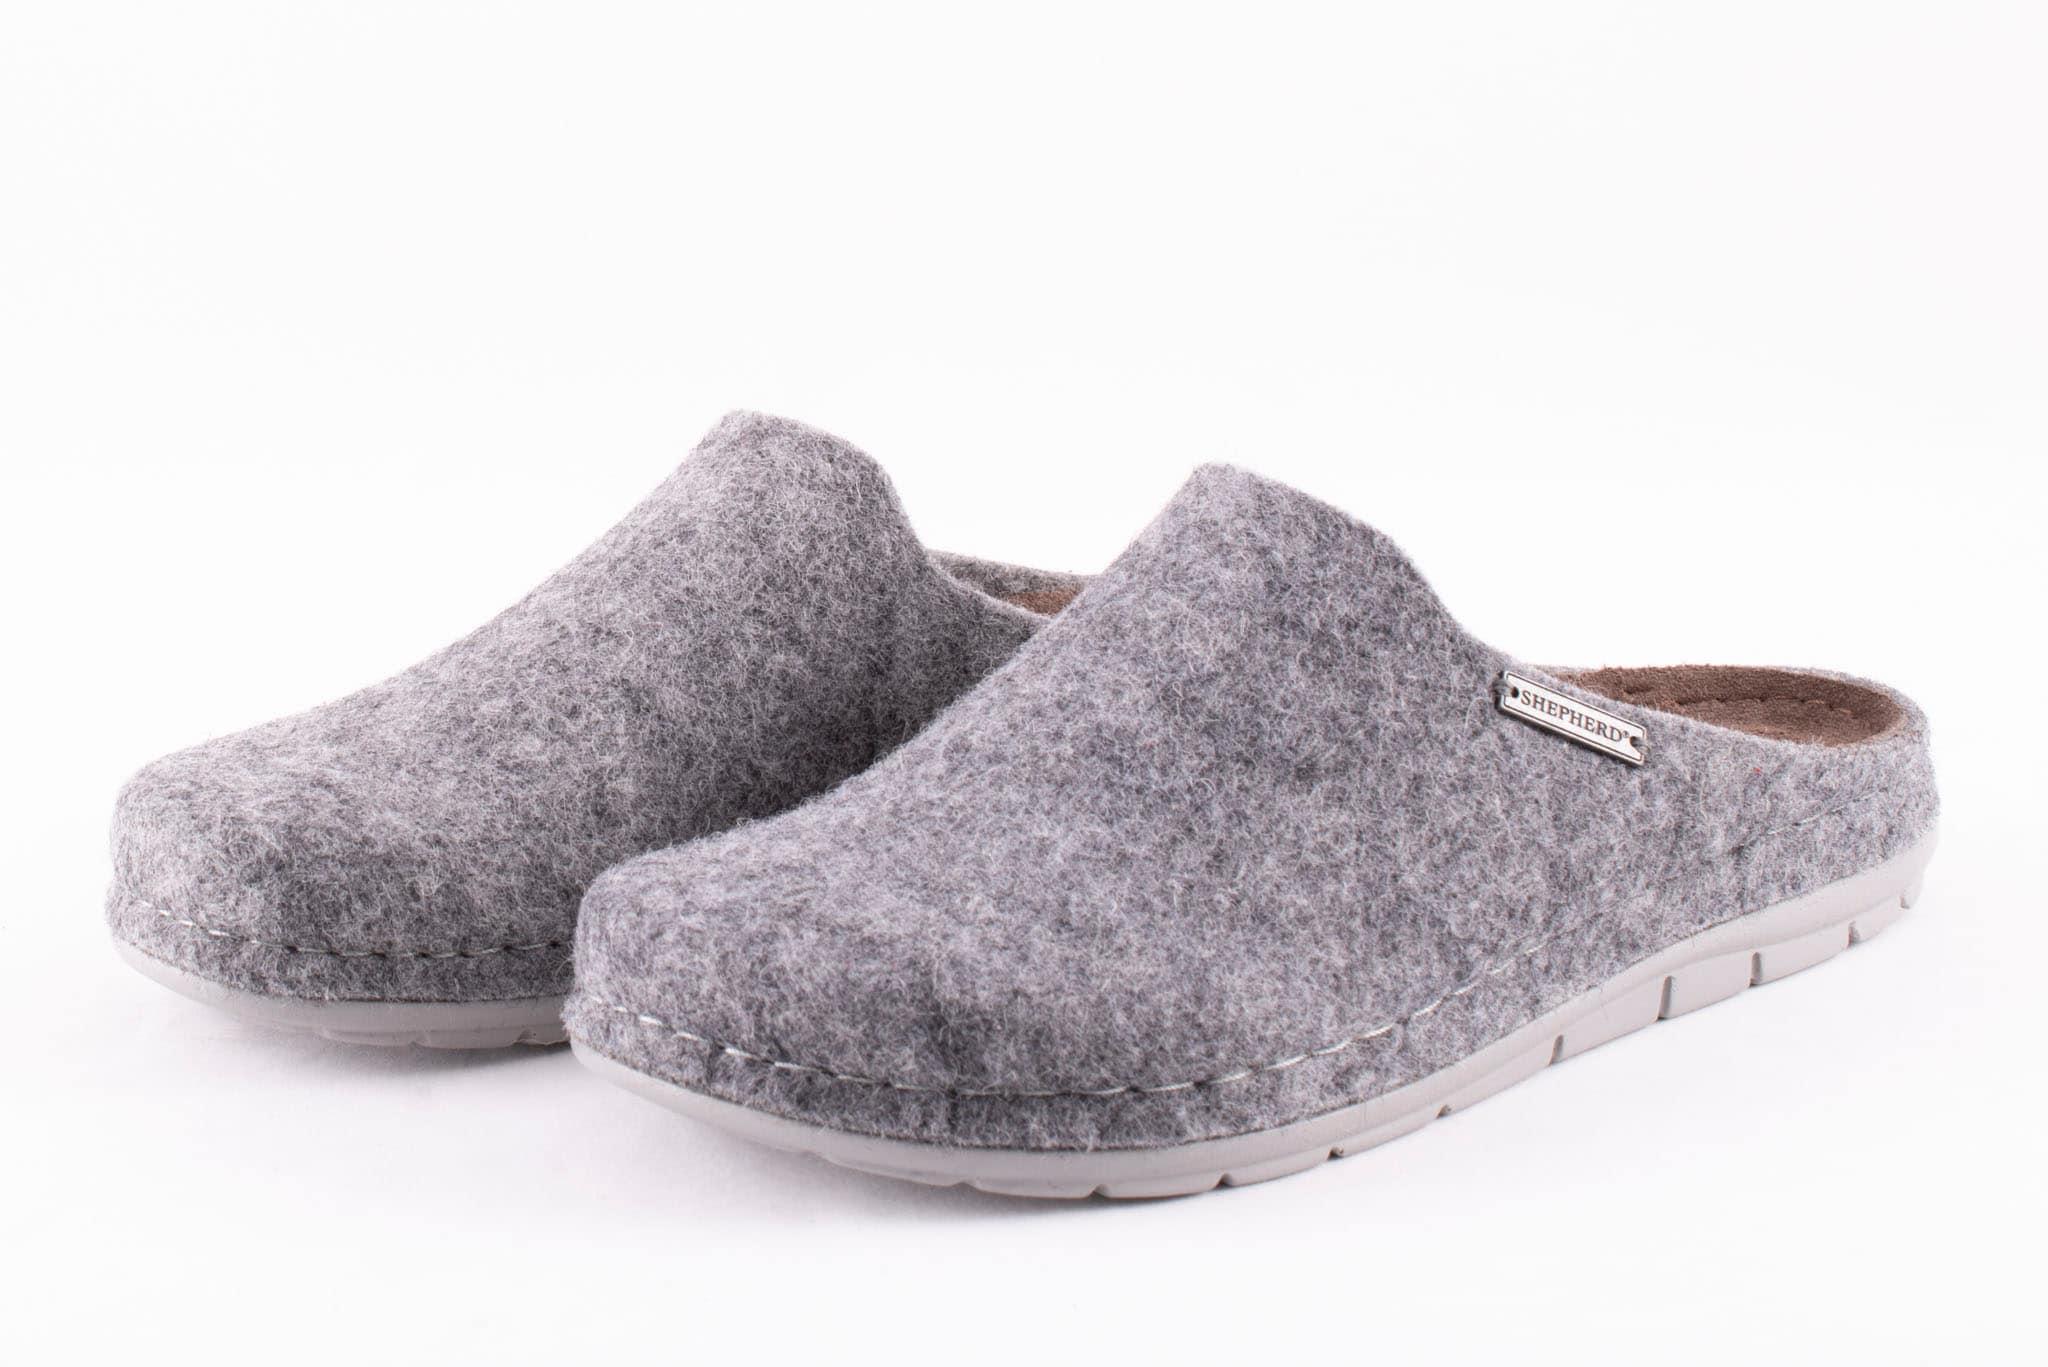 Annsofie wool slippers